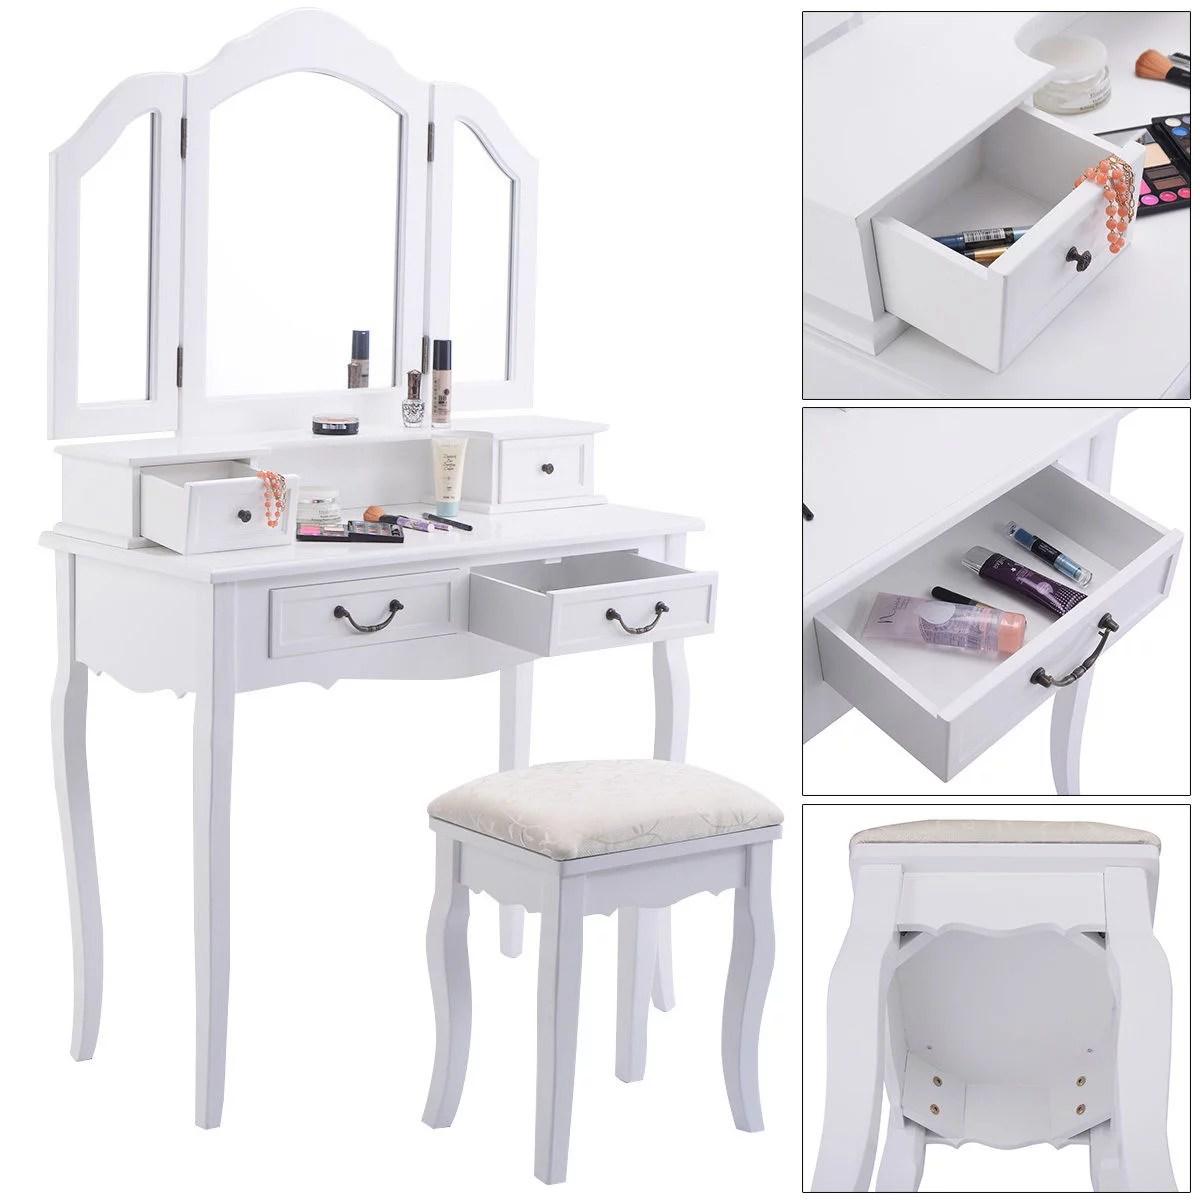 goplus tri folding mirror white wood vanity set makeup bathroom table dresser 4 drawers stool walmart com